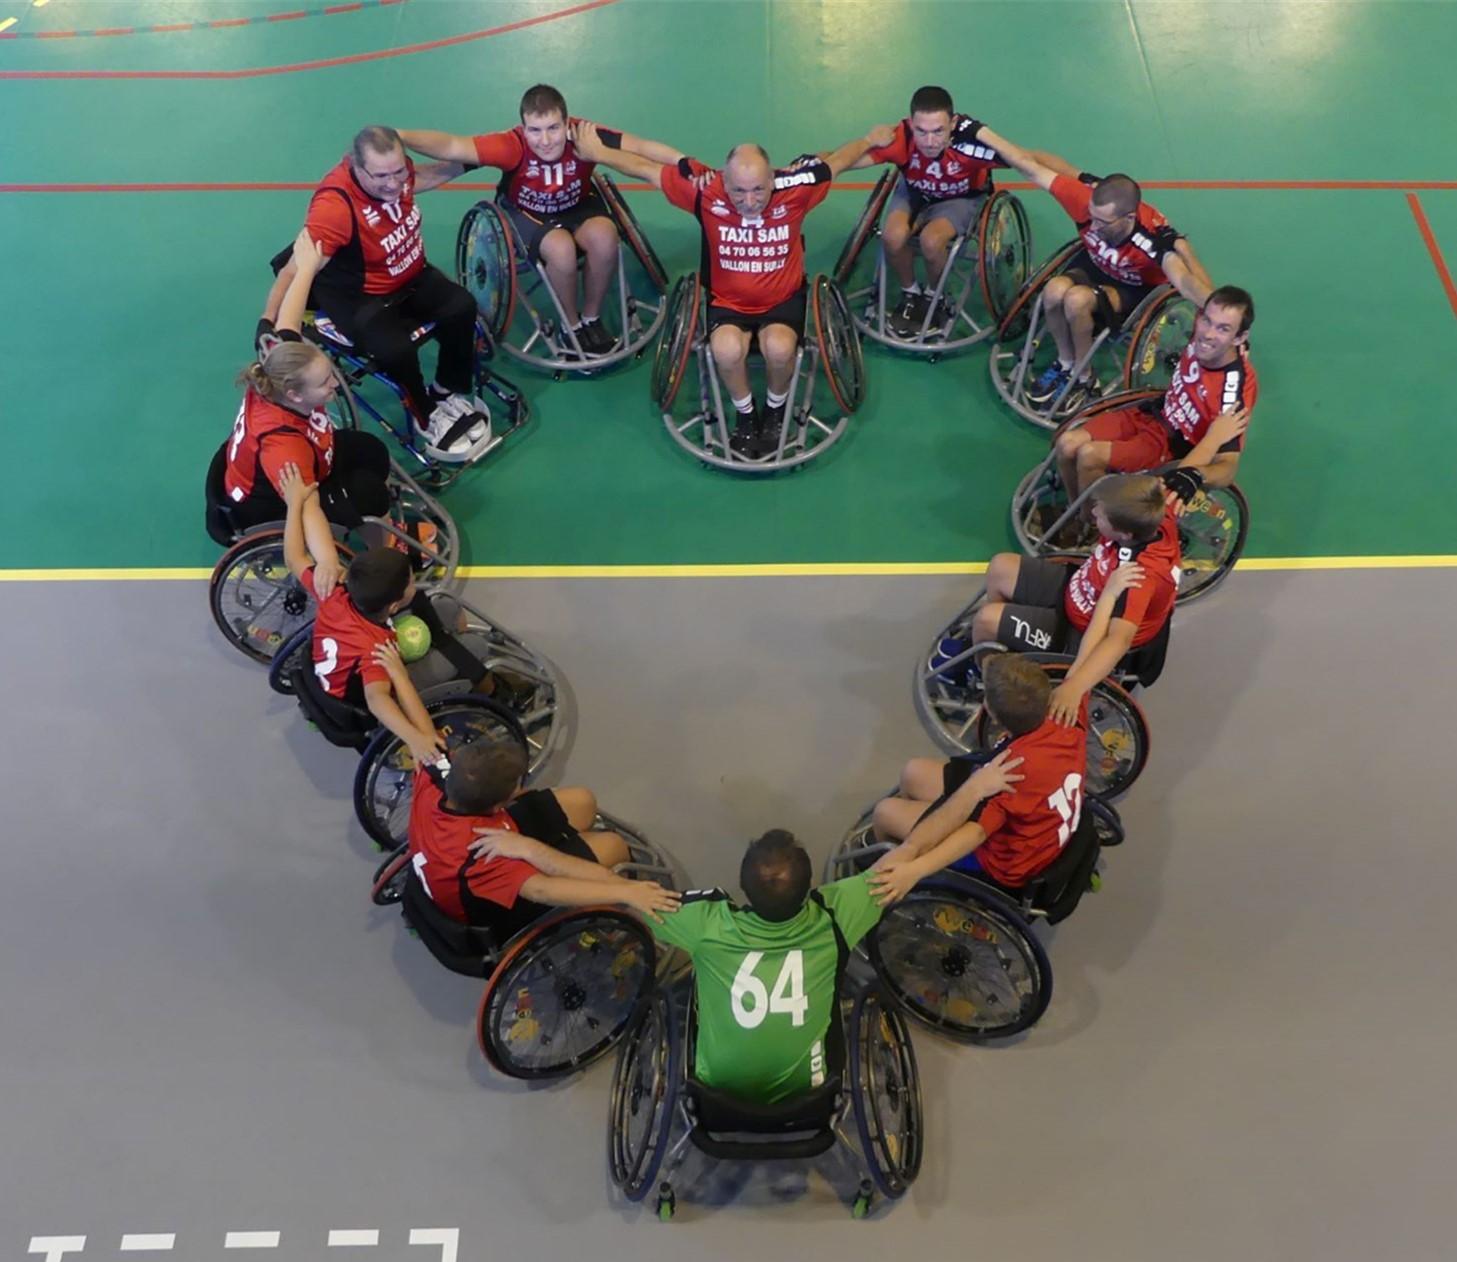 Handisport - Achat d'un fauteuil sportif